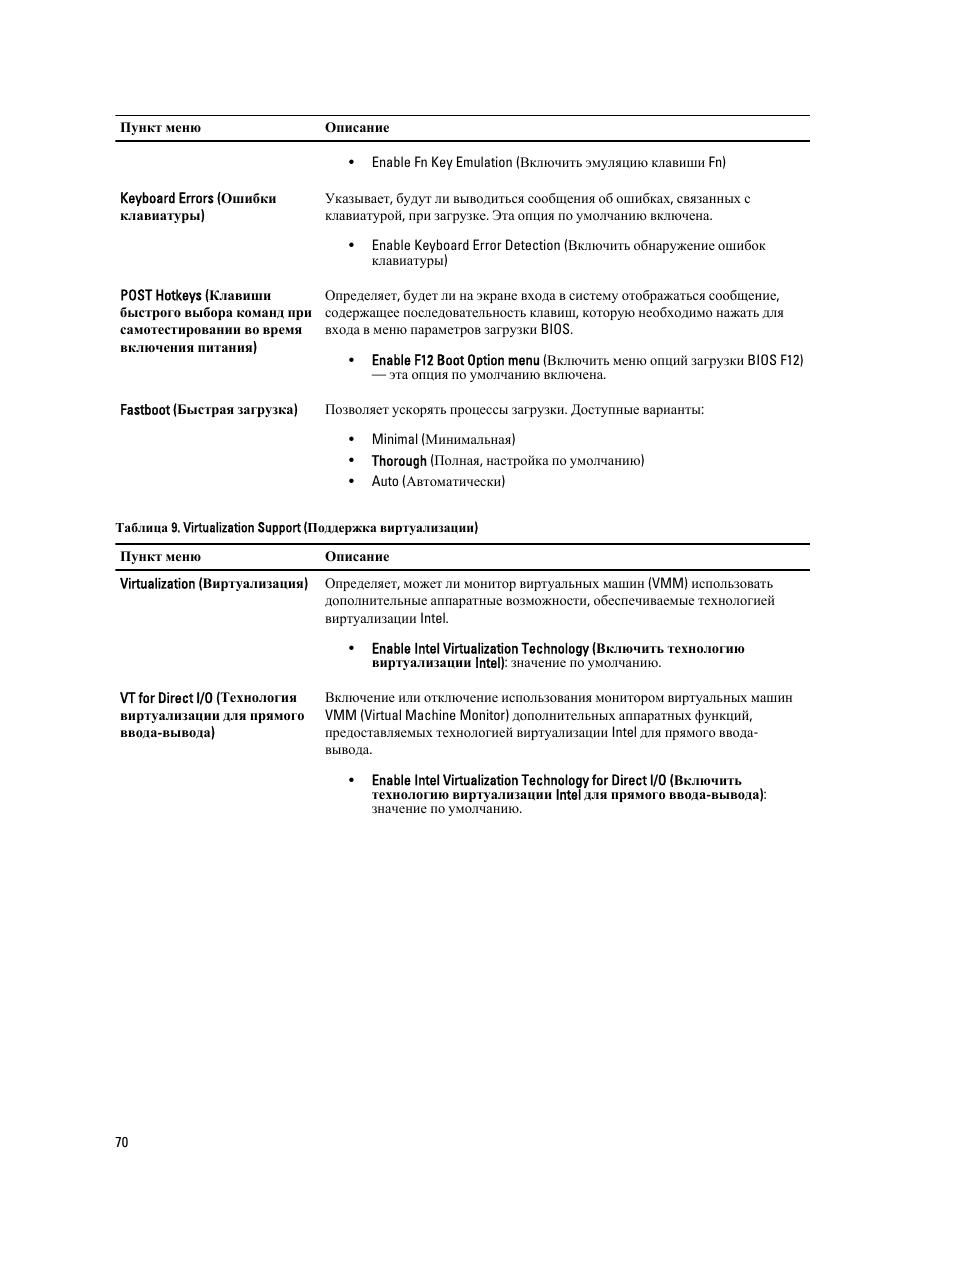 Инструкция по эксплуатации Dell Latitude E6430 ATG